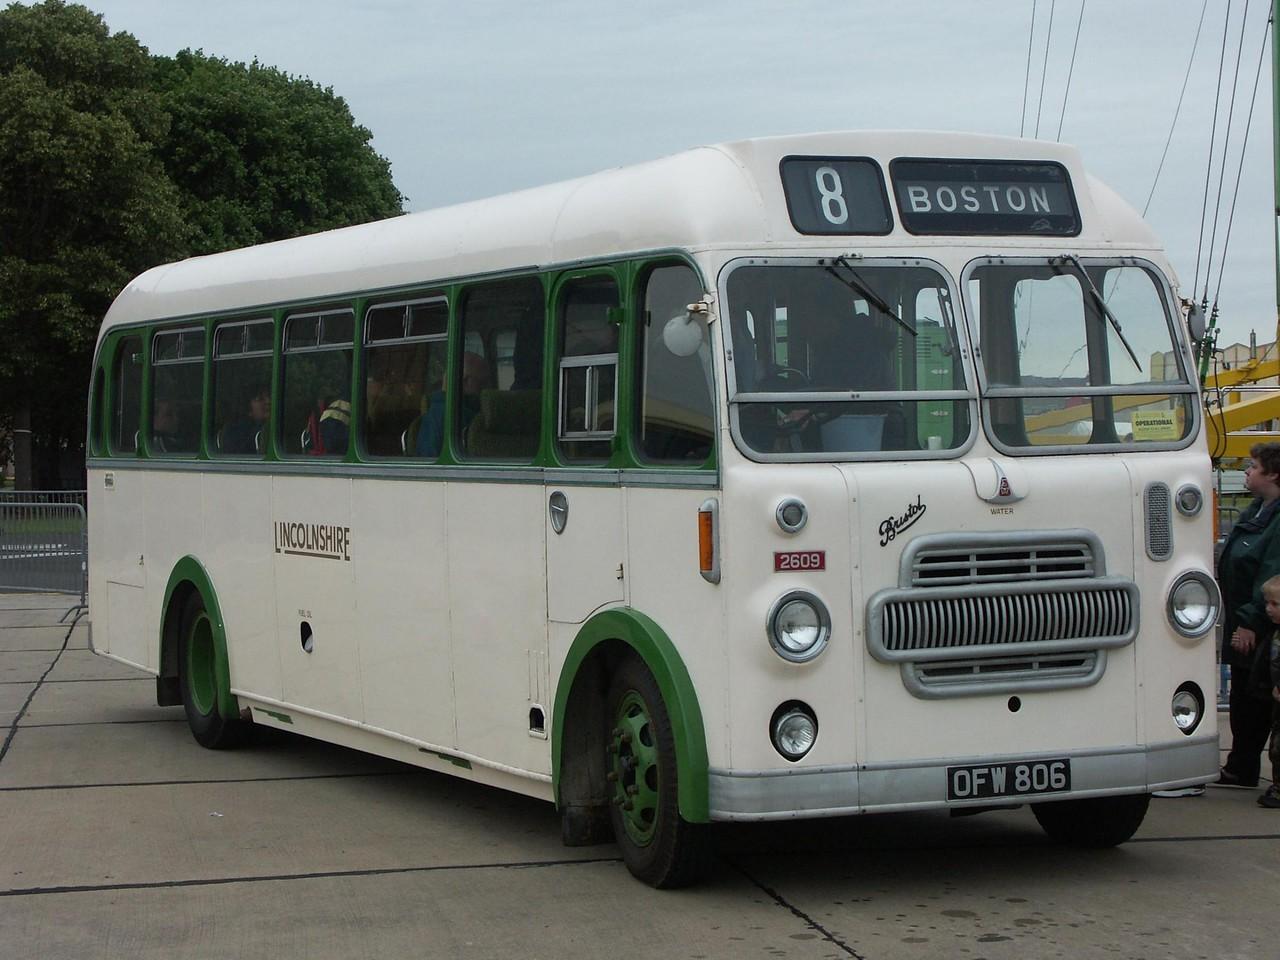 OFW 806 BRISTOL SC 1957